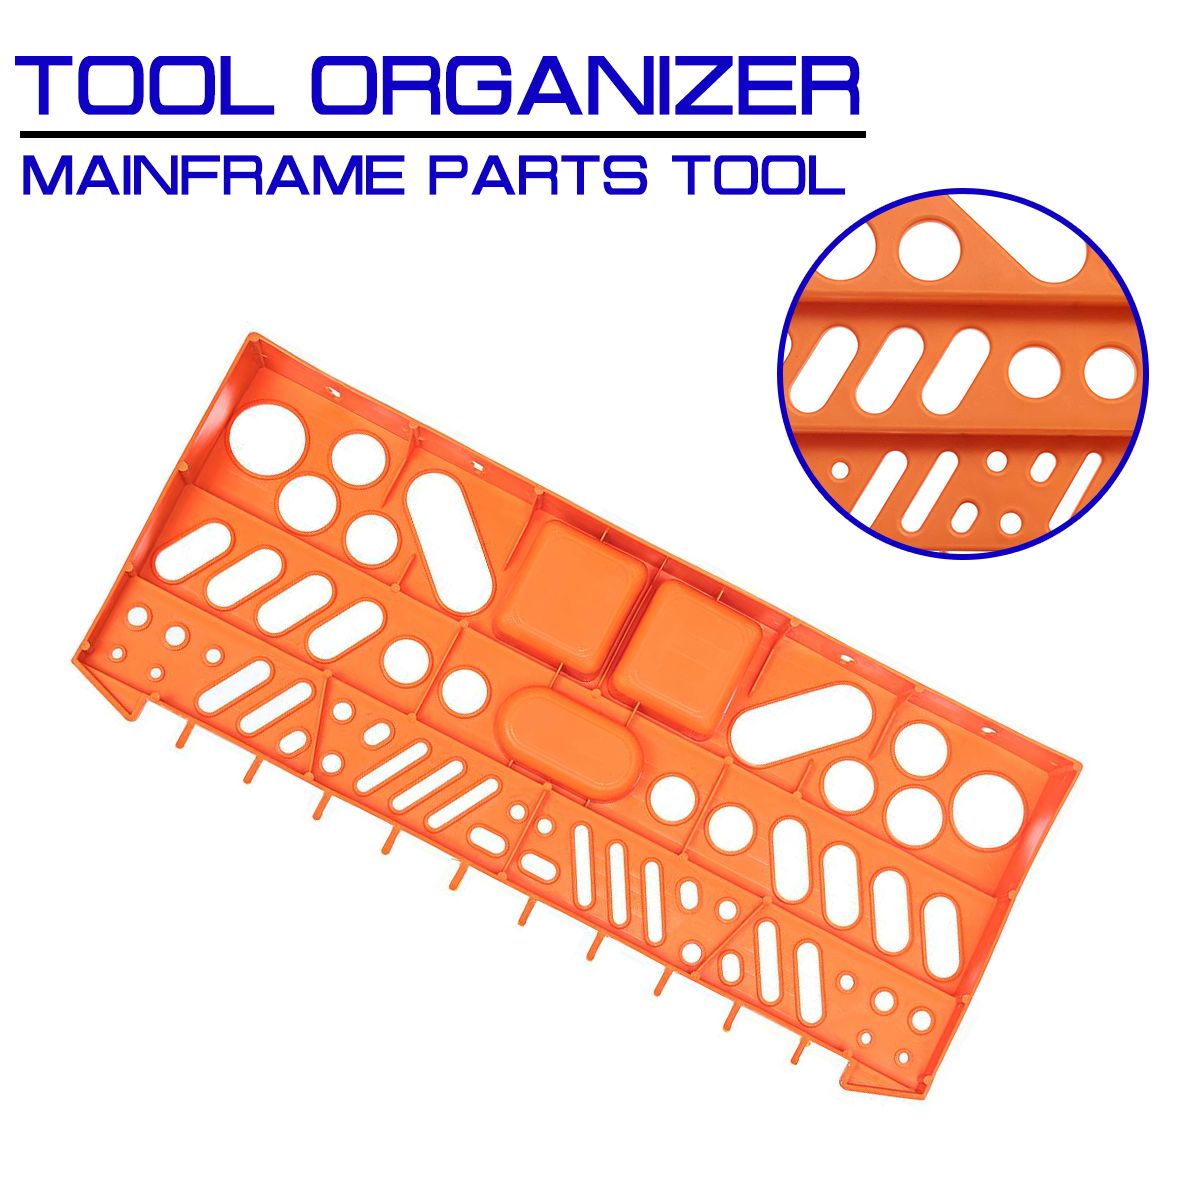 Mainframe Parts Tool Mobile Phone Repair Storage Box Organizer Wall Shelf Holder Pliers Rack Screwdriver Garage Hangers